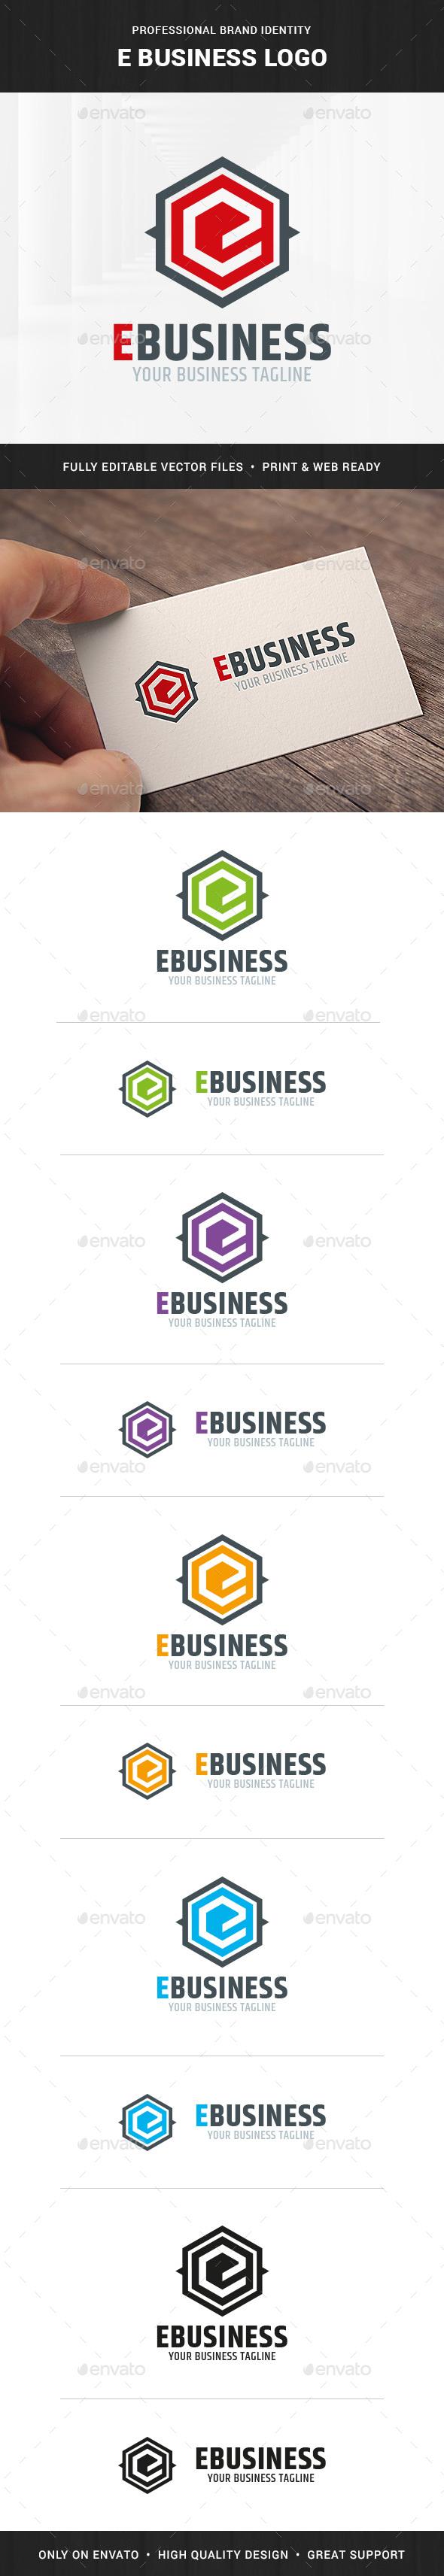 E-Business - Letter E Logo Template - Letters Logo Templates